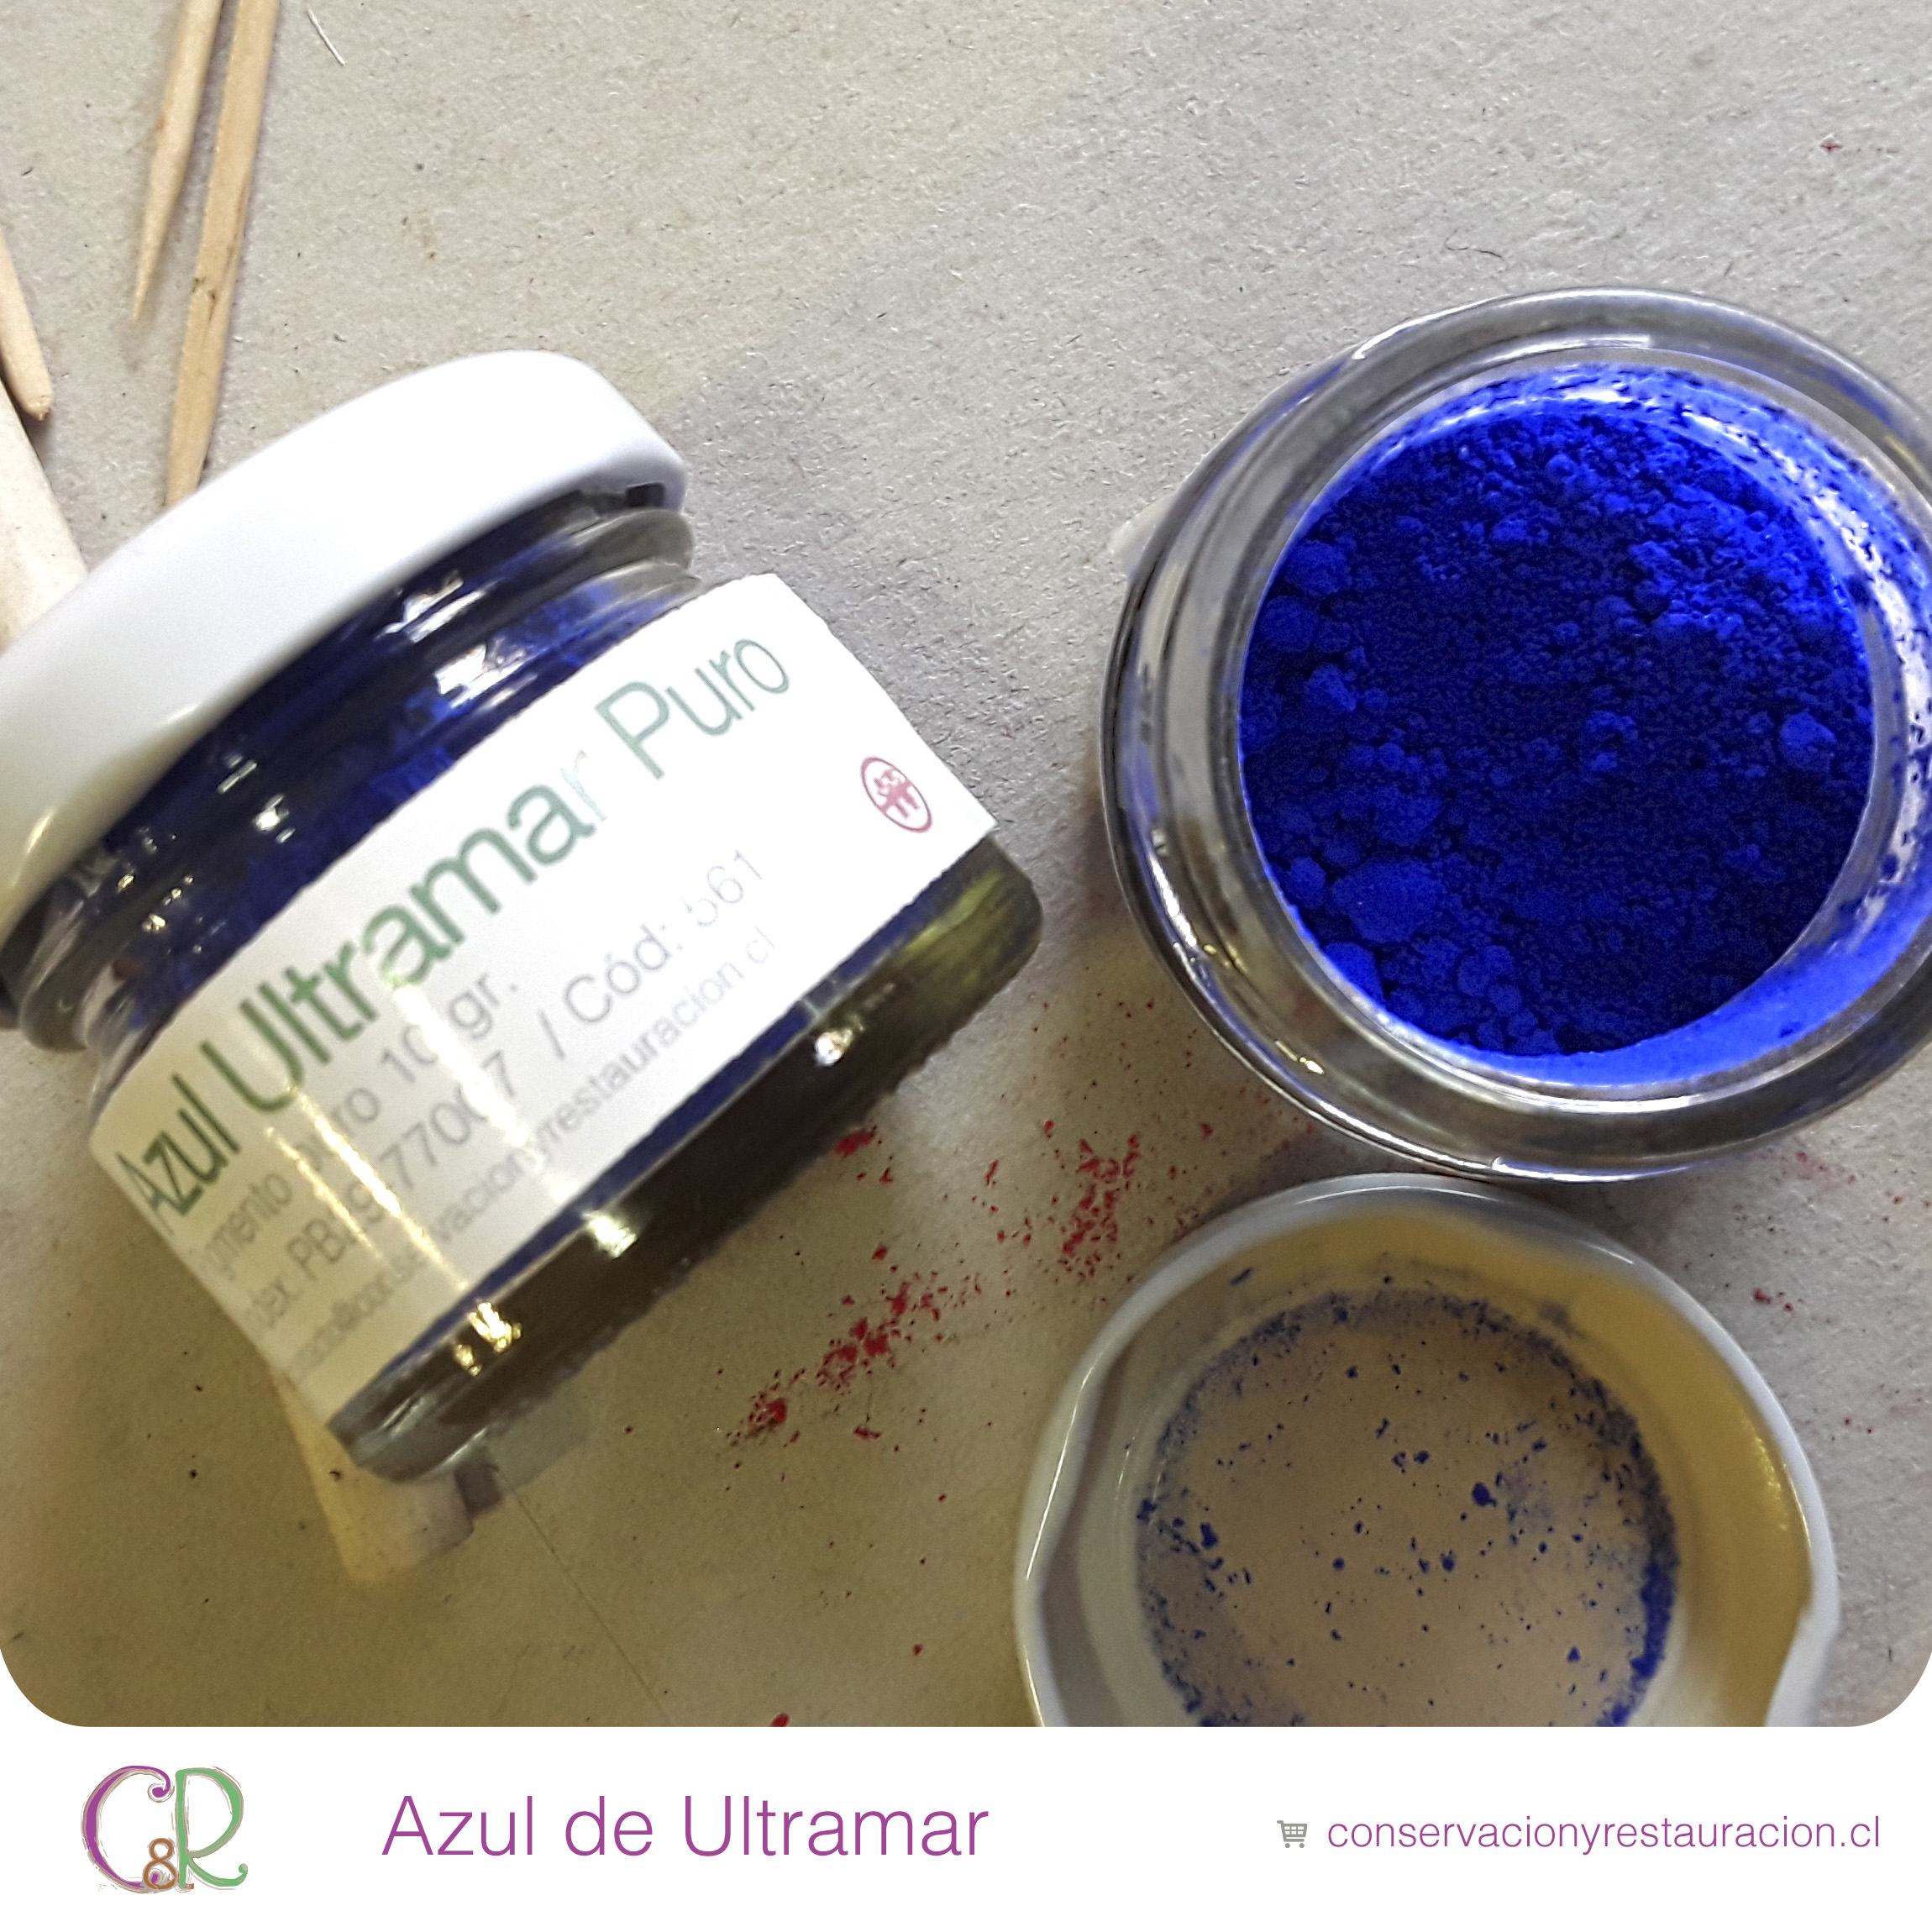 Azul de Ultramar Pigmento en Chile